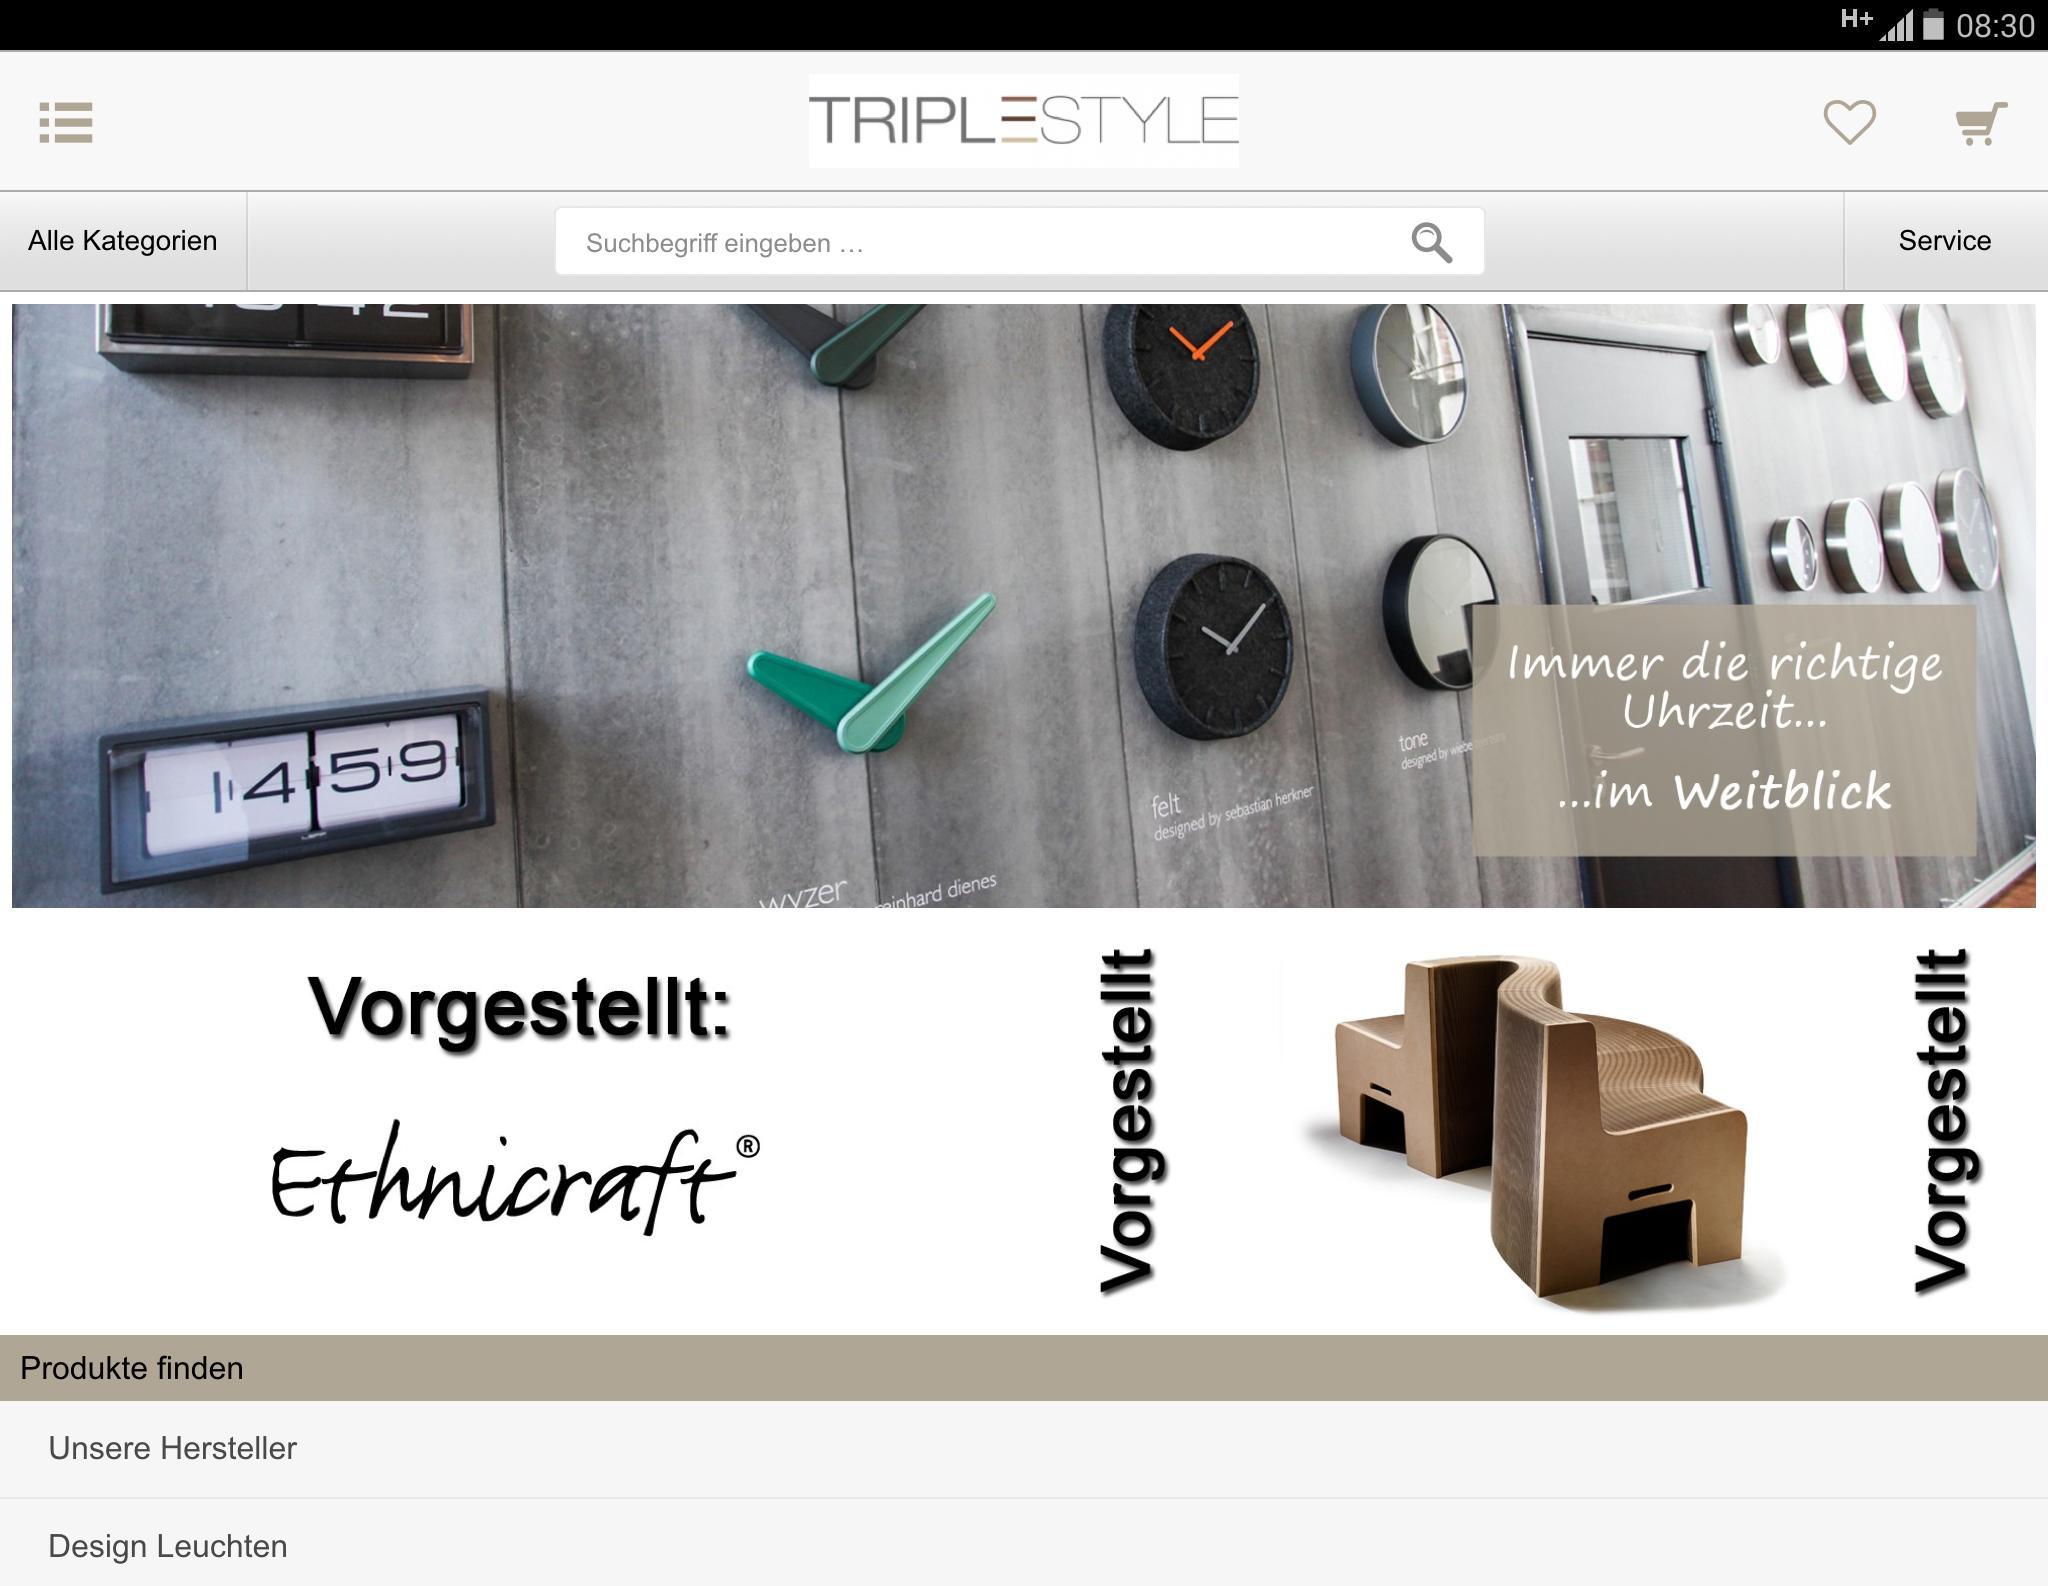 123style.de design möbel for android - apk download